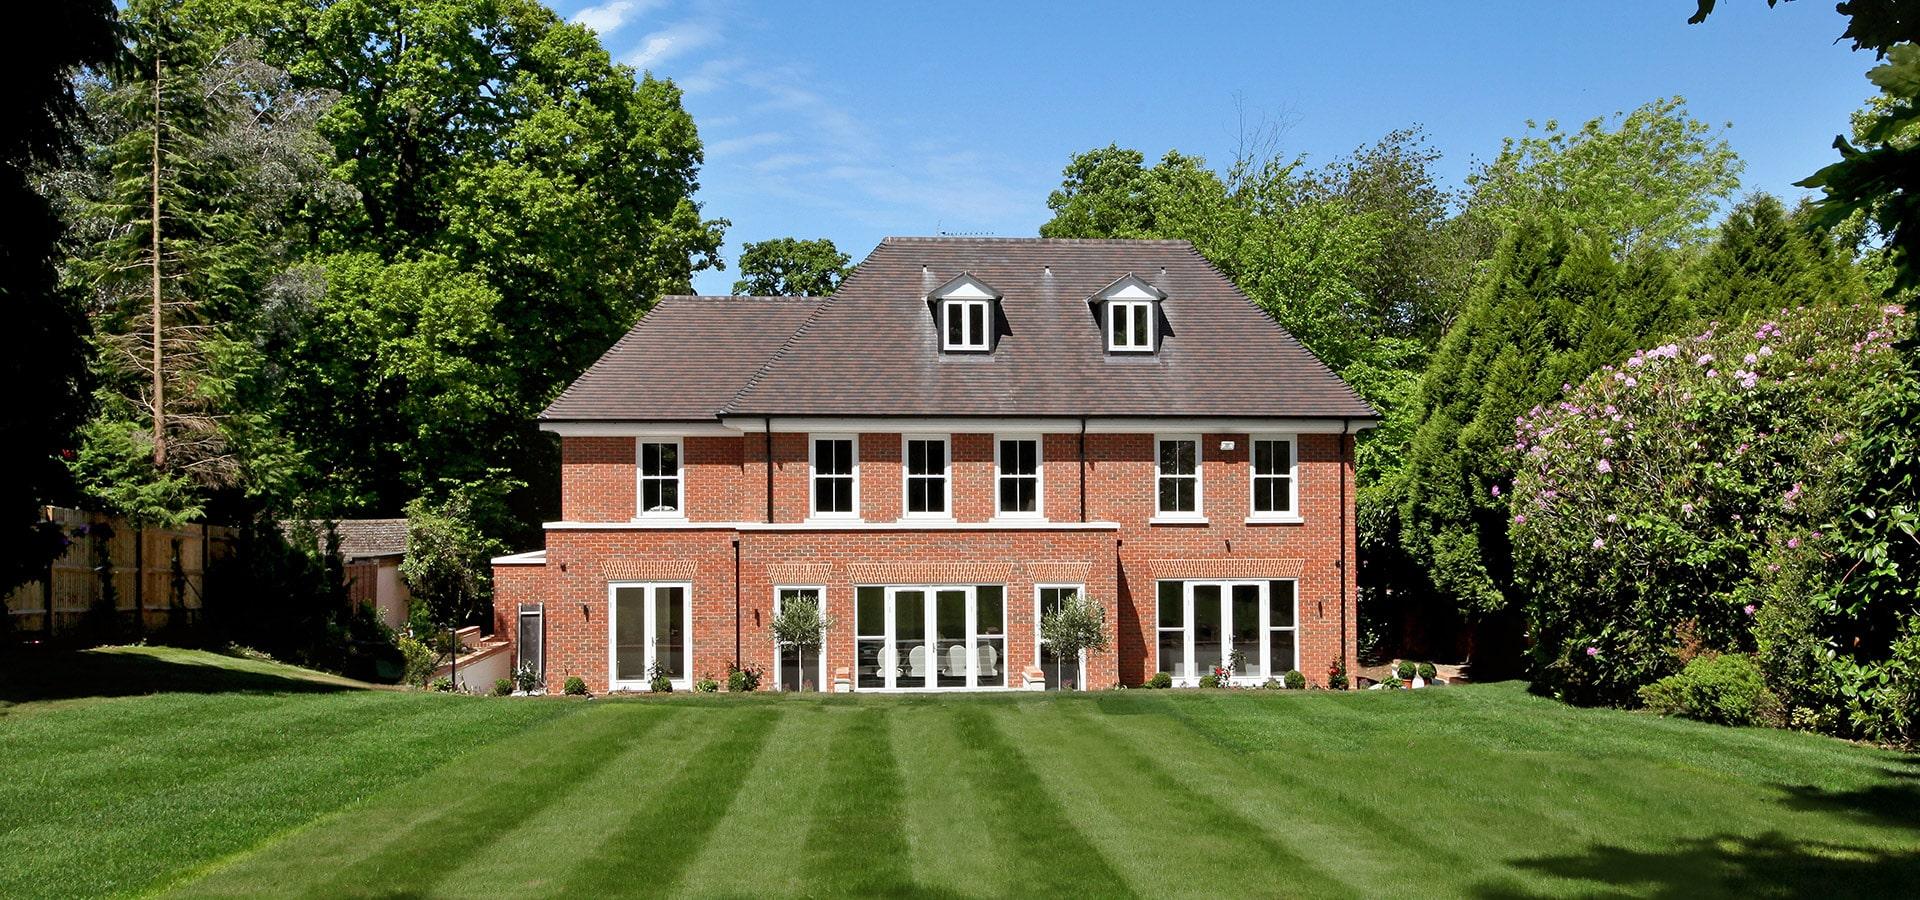 Property Sale Kingswood Surrey Bears Den